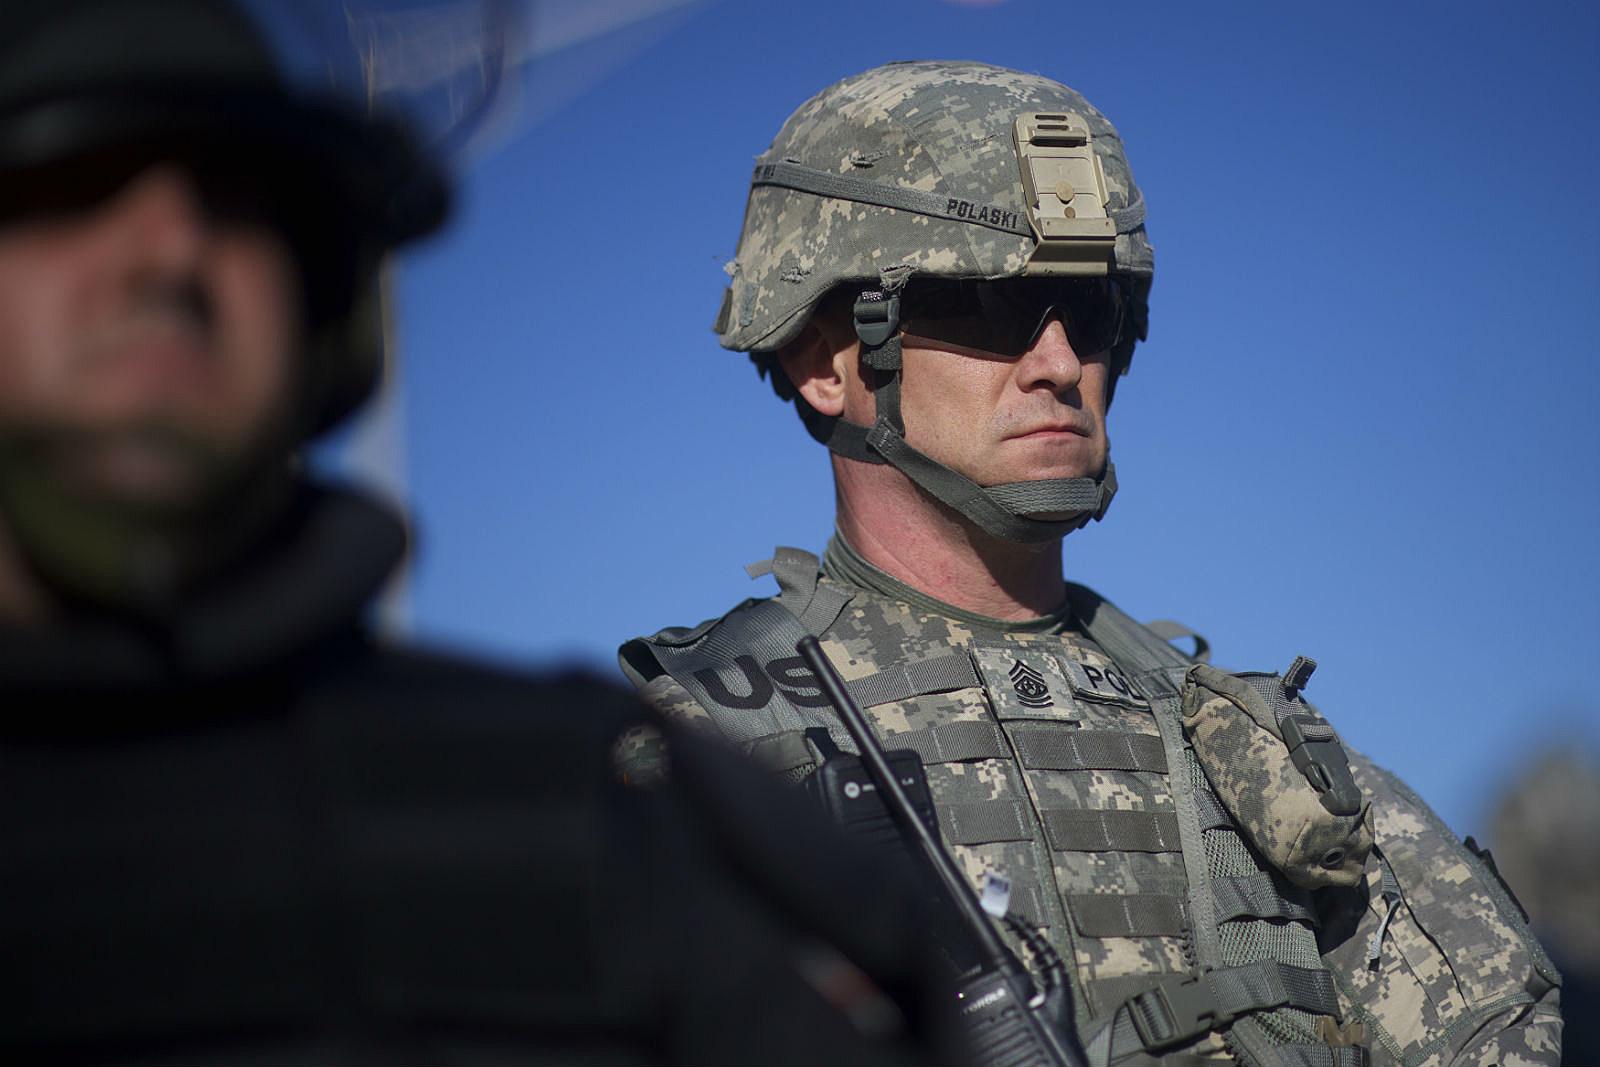 National Guard_Mark Makela/Getty